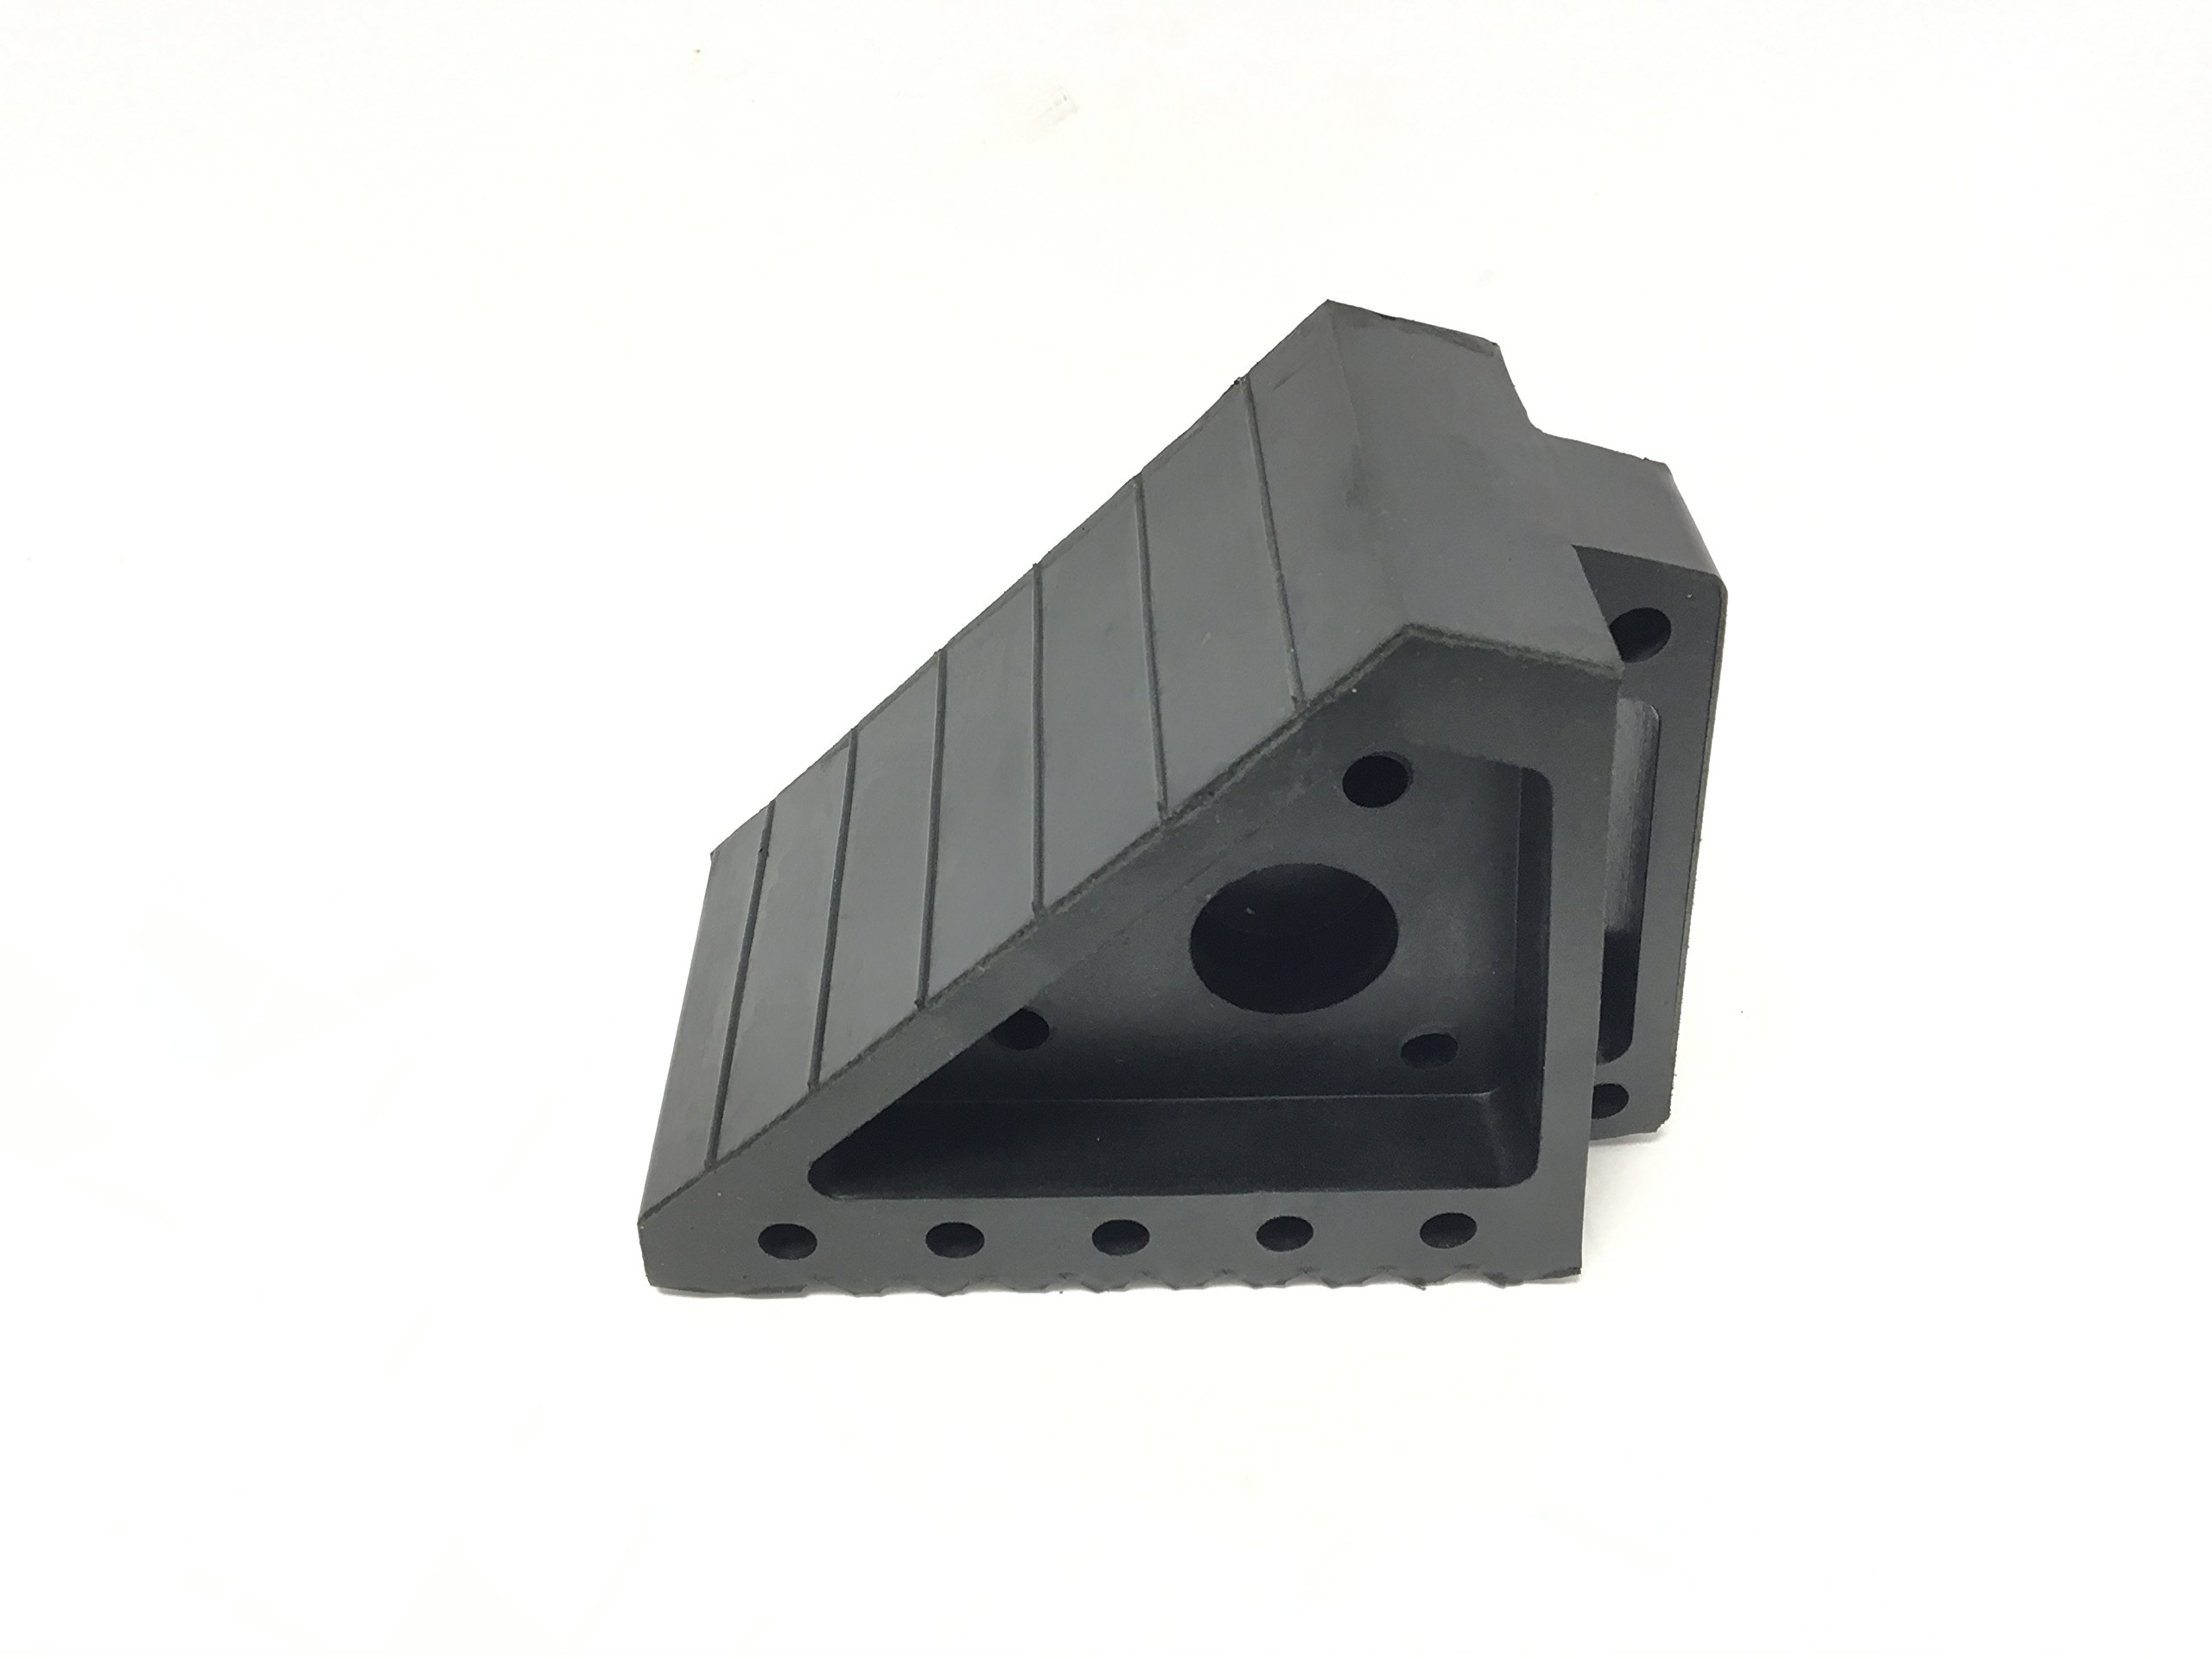 MaxxHaul 70472 Solid Rubber Heavy Duty Black Wheel Chock, 8'' long x 4'' wide x 6'' high - 2 Pack